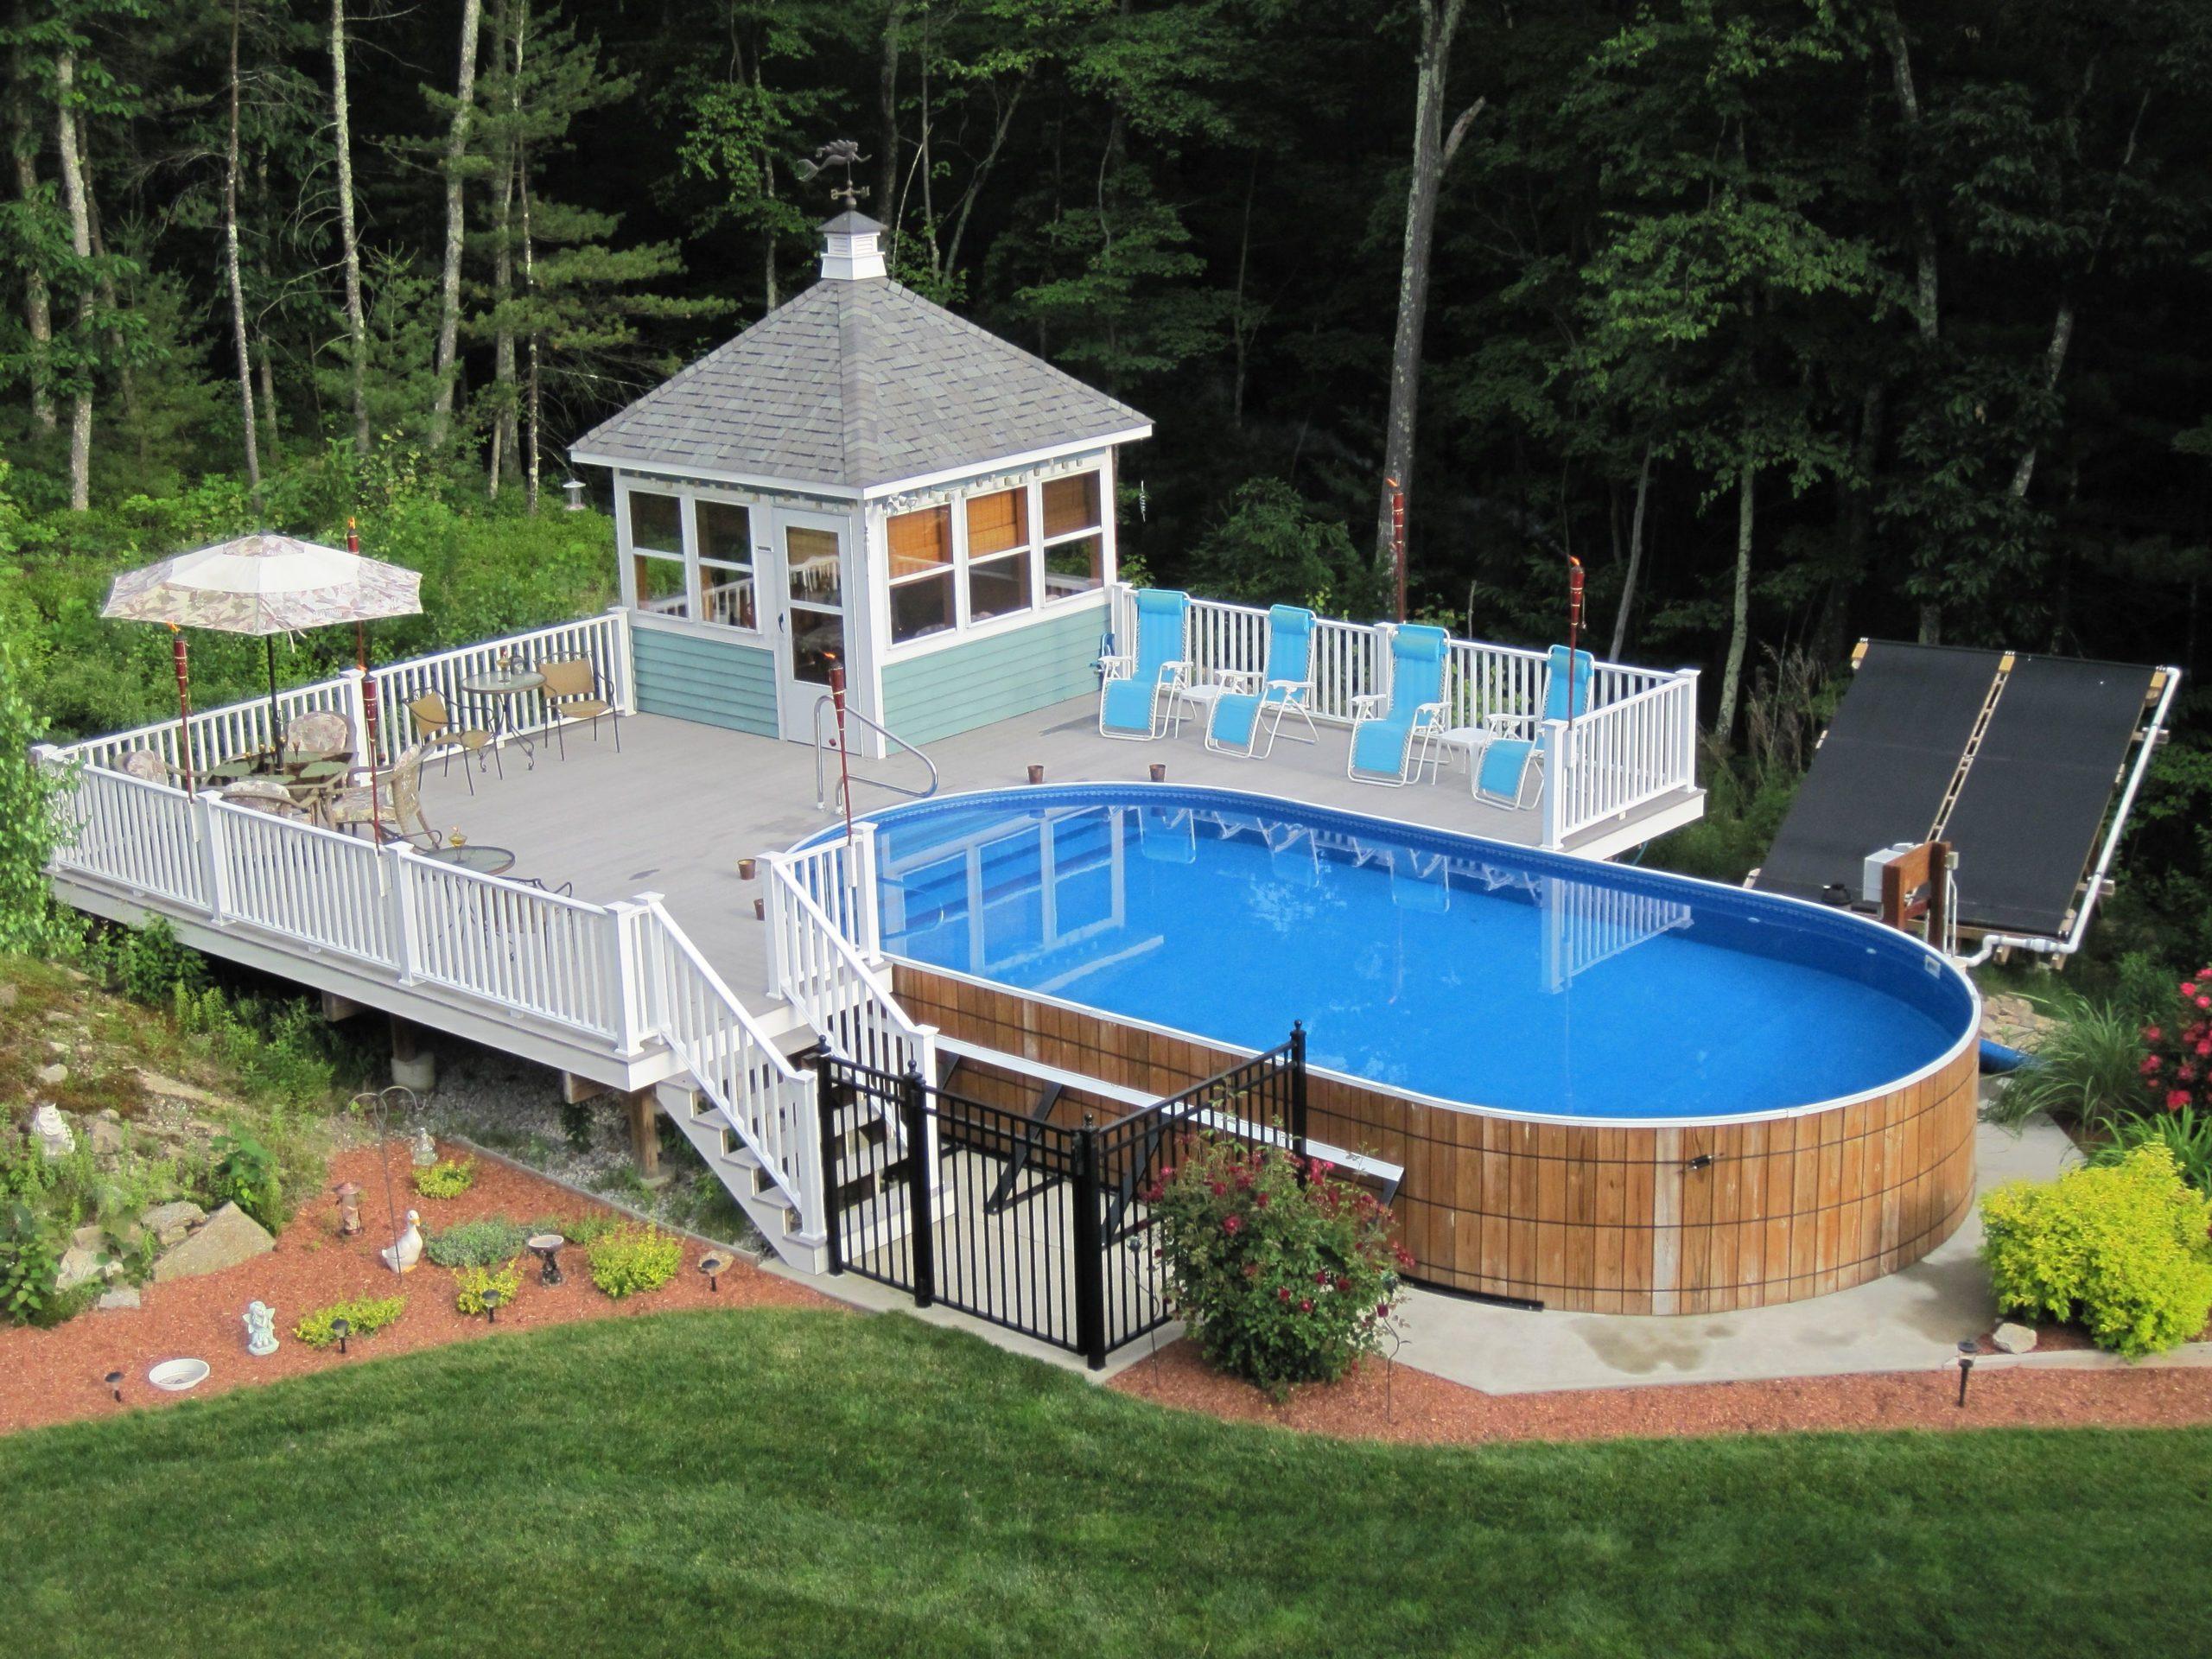 Les grands chantiers peuvent naturellement accueillir une piscine plus large.